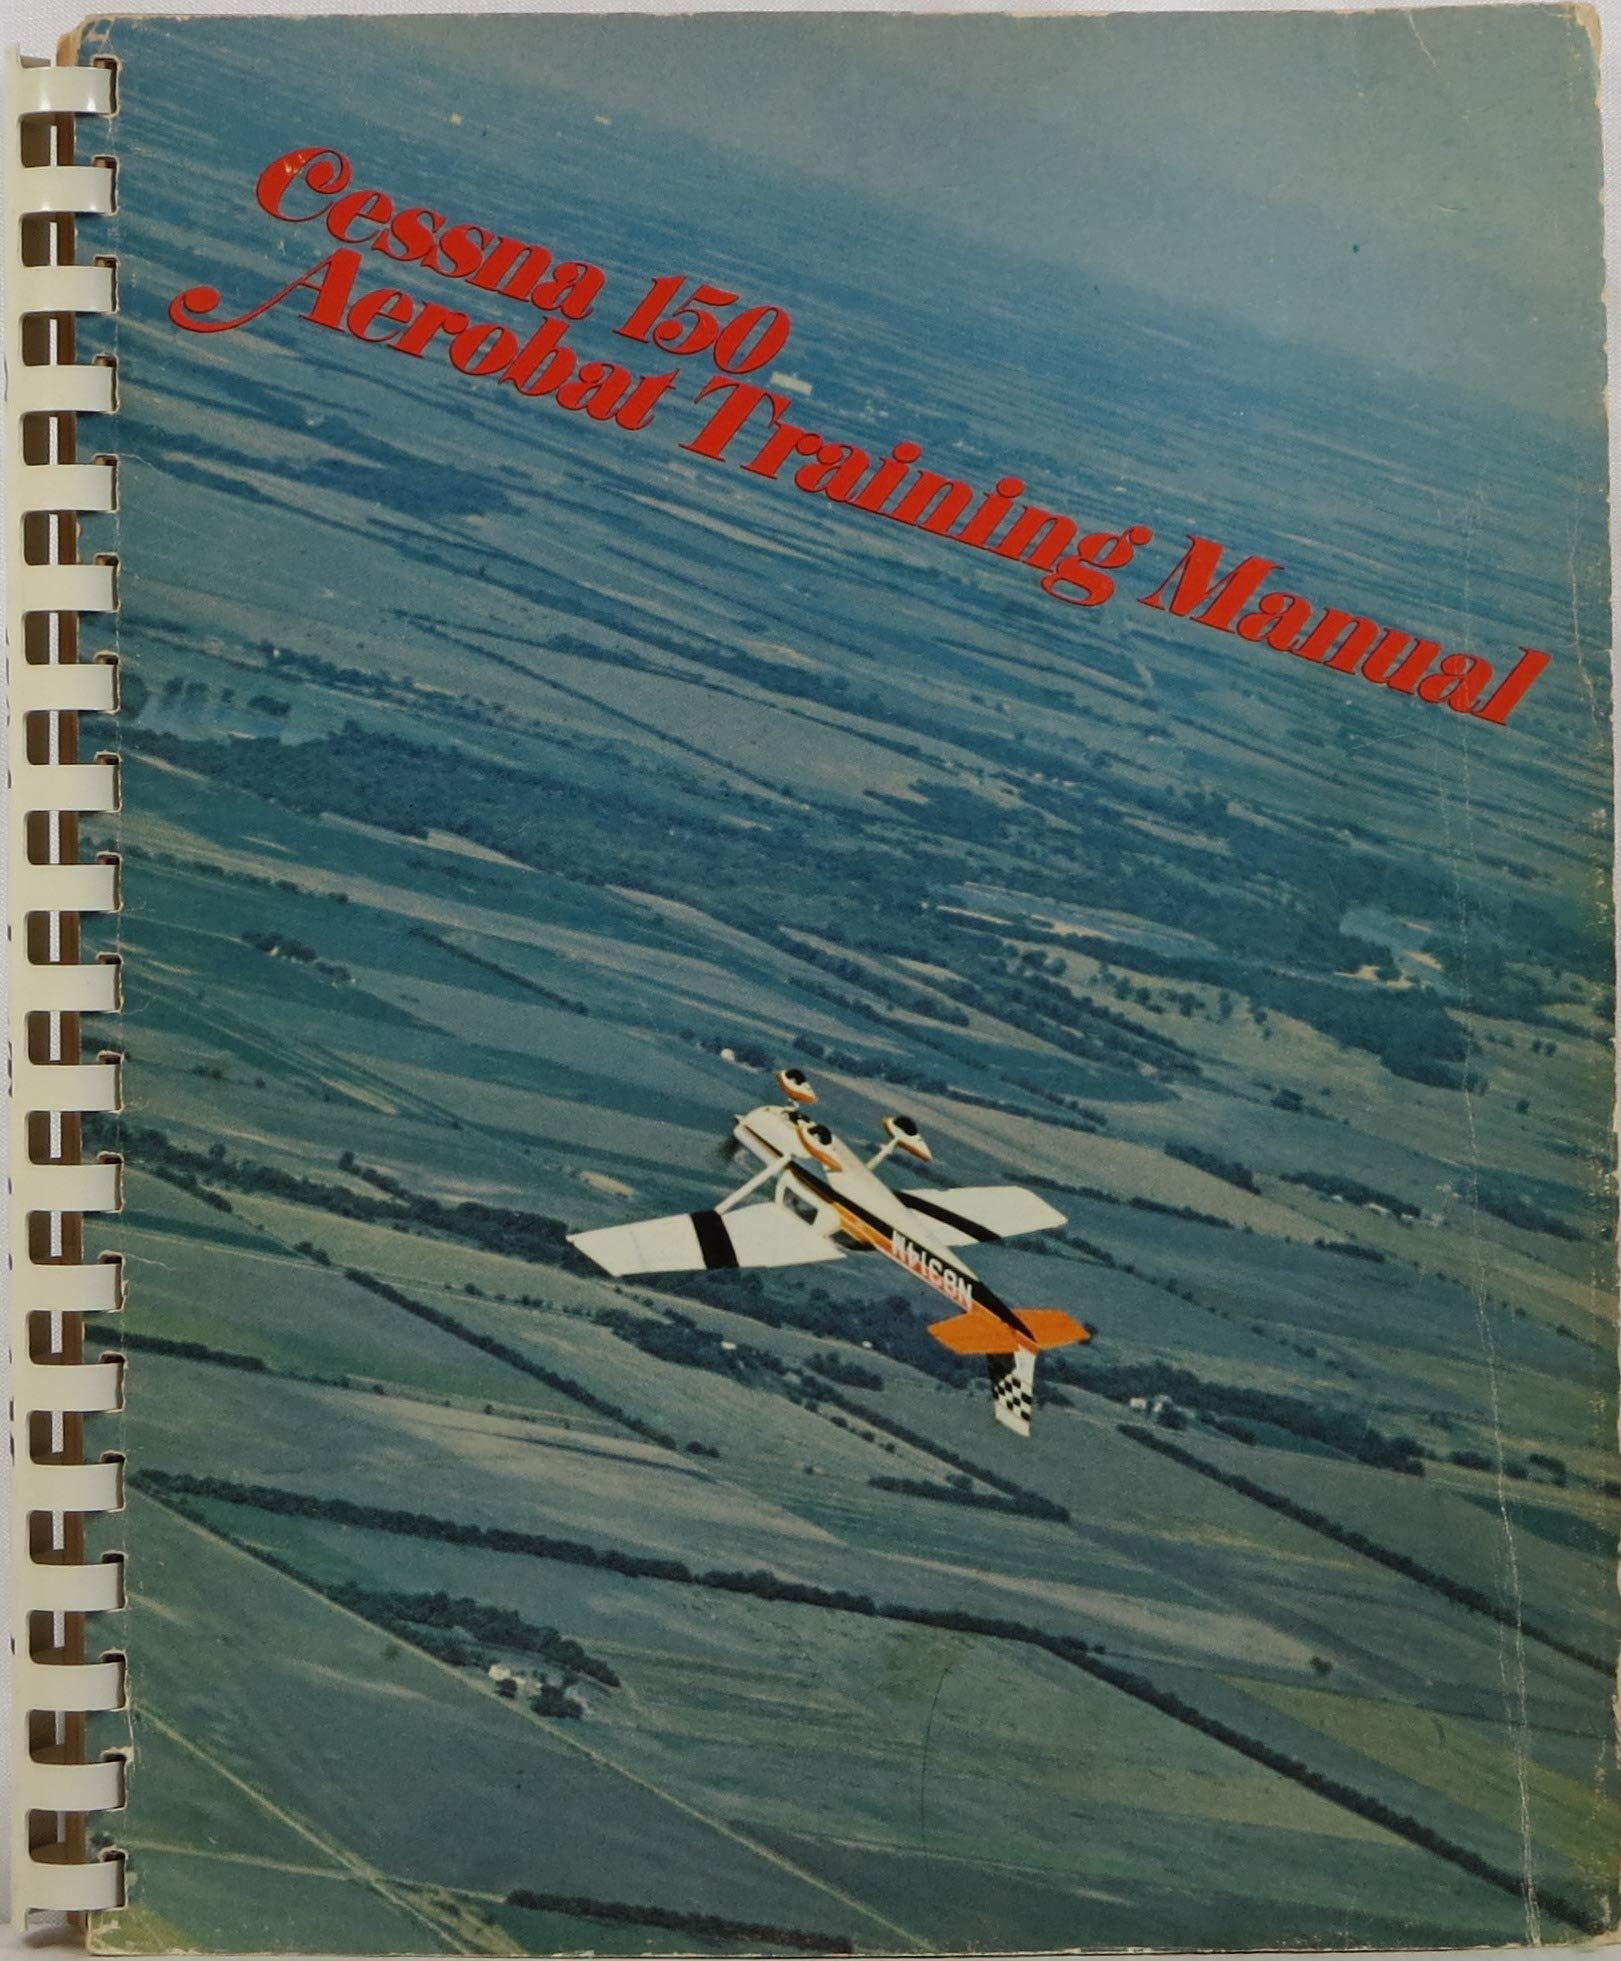 Cessna 150 Aerobat Training Manual: William K  Kershner